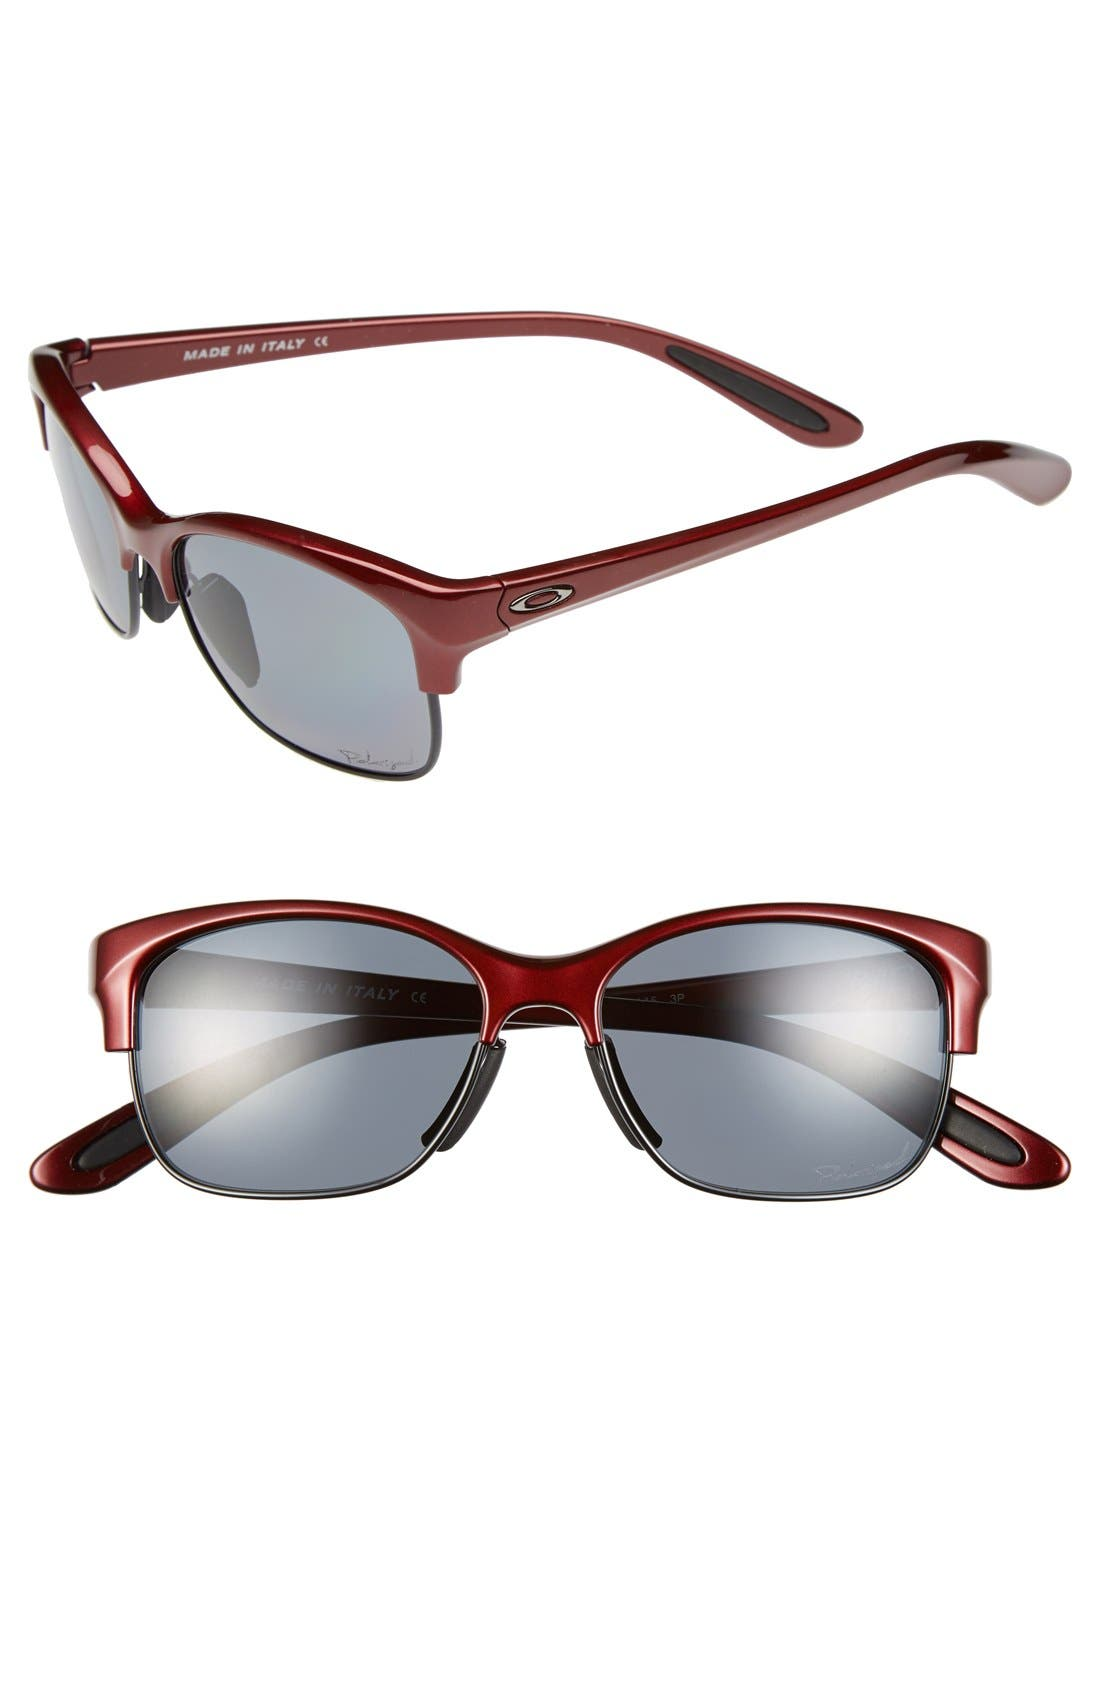 Main Image - Oakley 'RSVP' 53mm Sunglasses